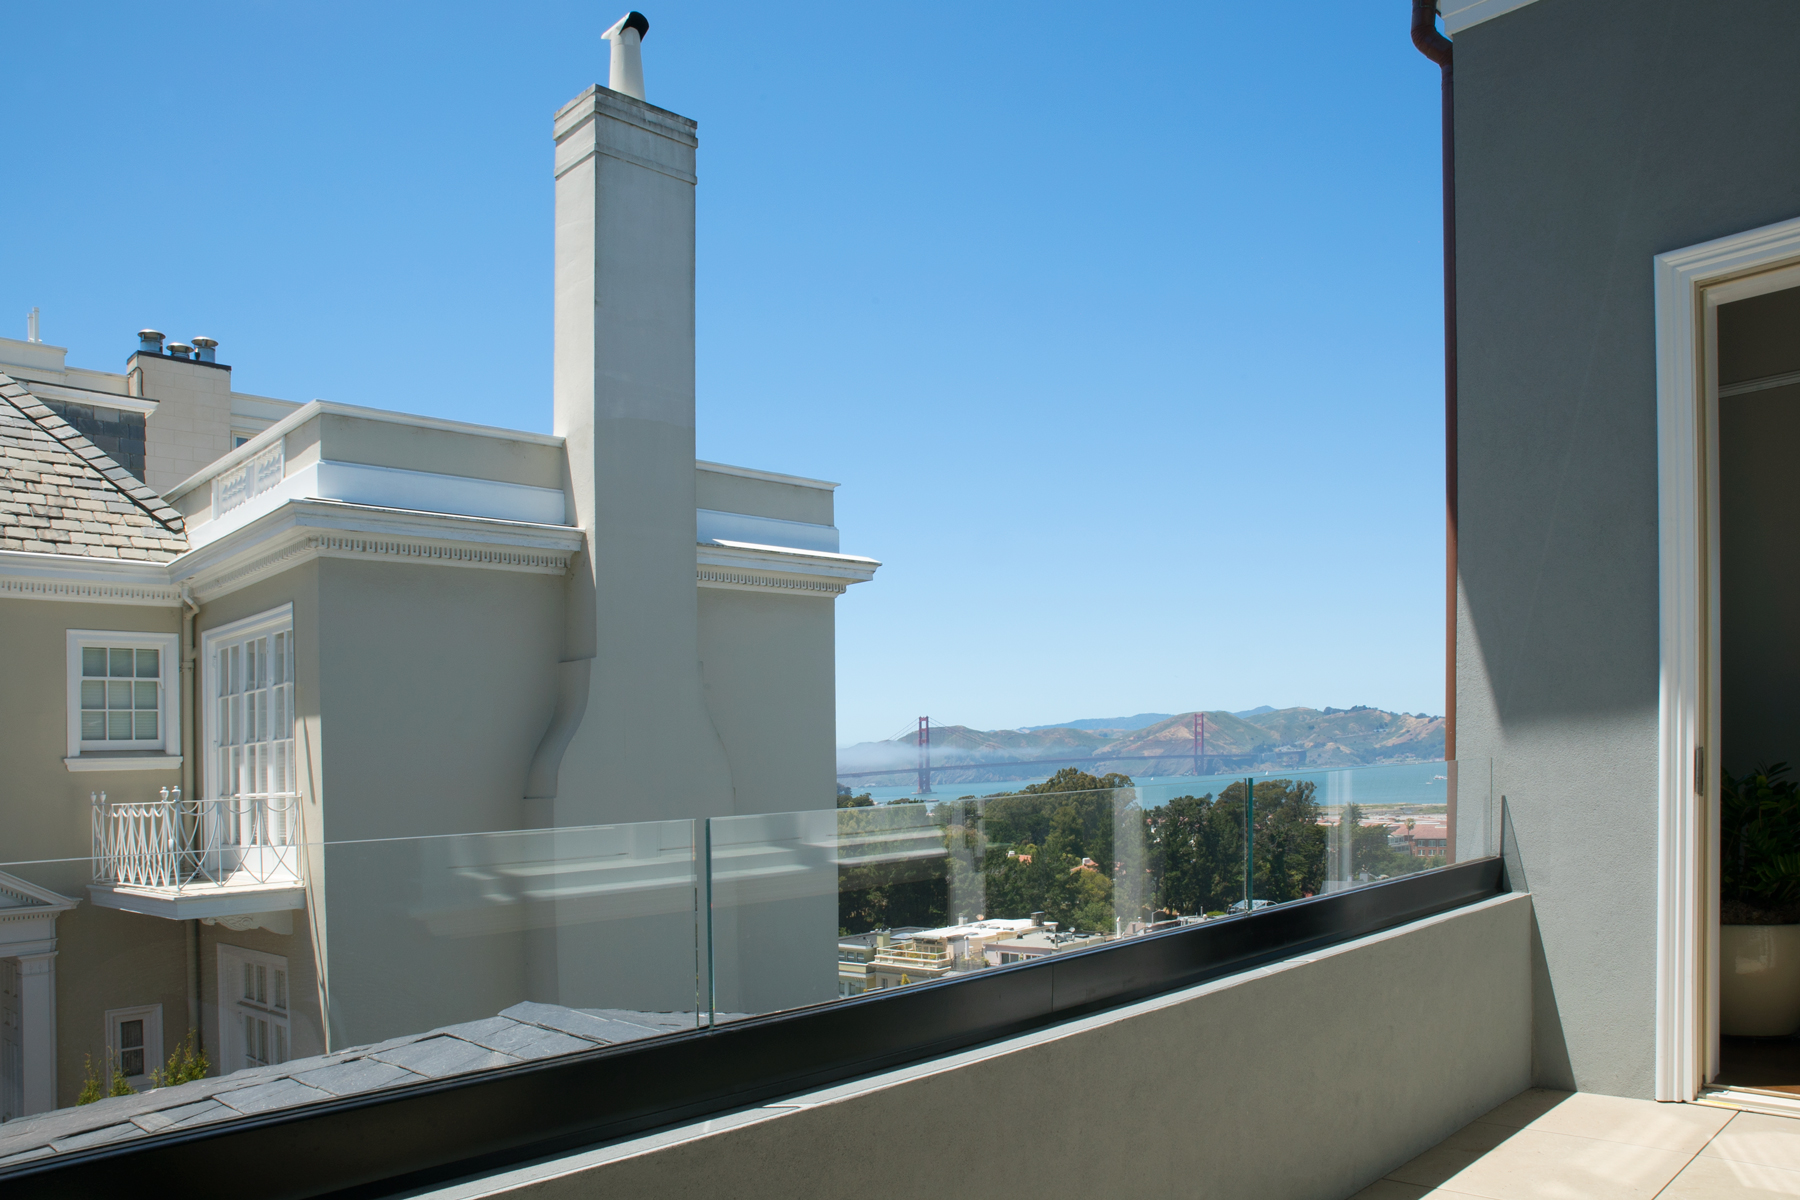 TT-2900-2131-Balcony-1800px.jpg